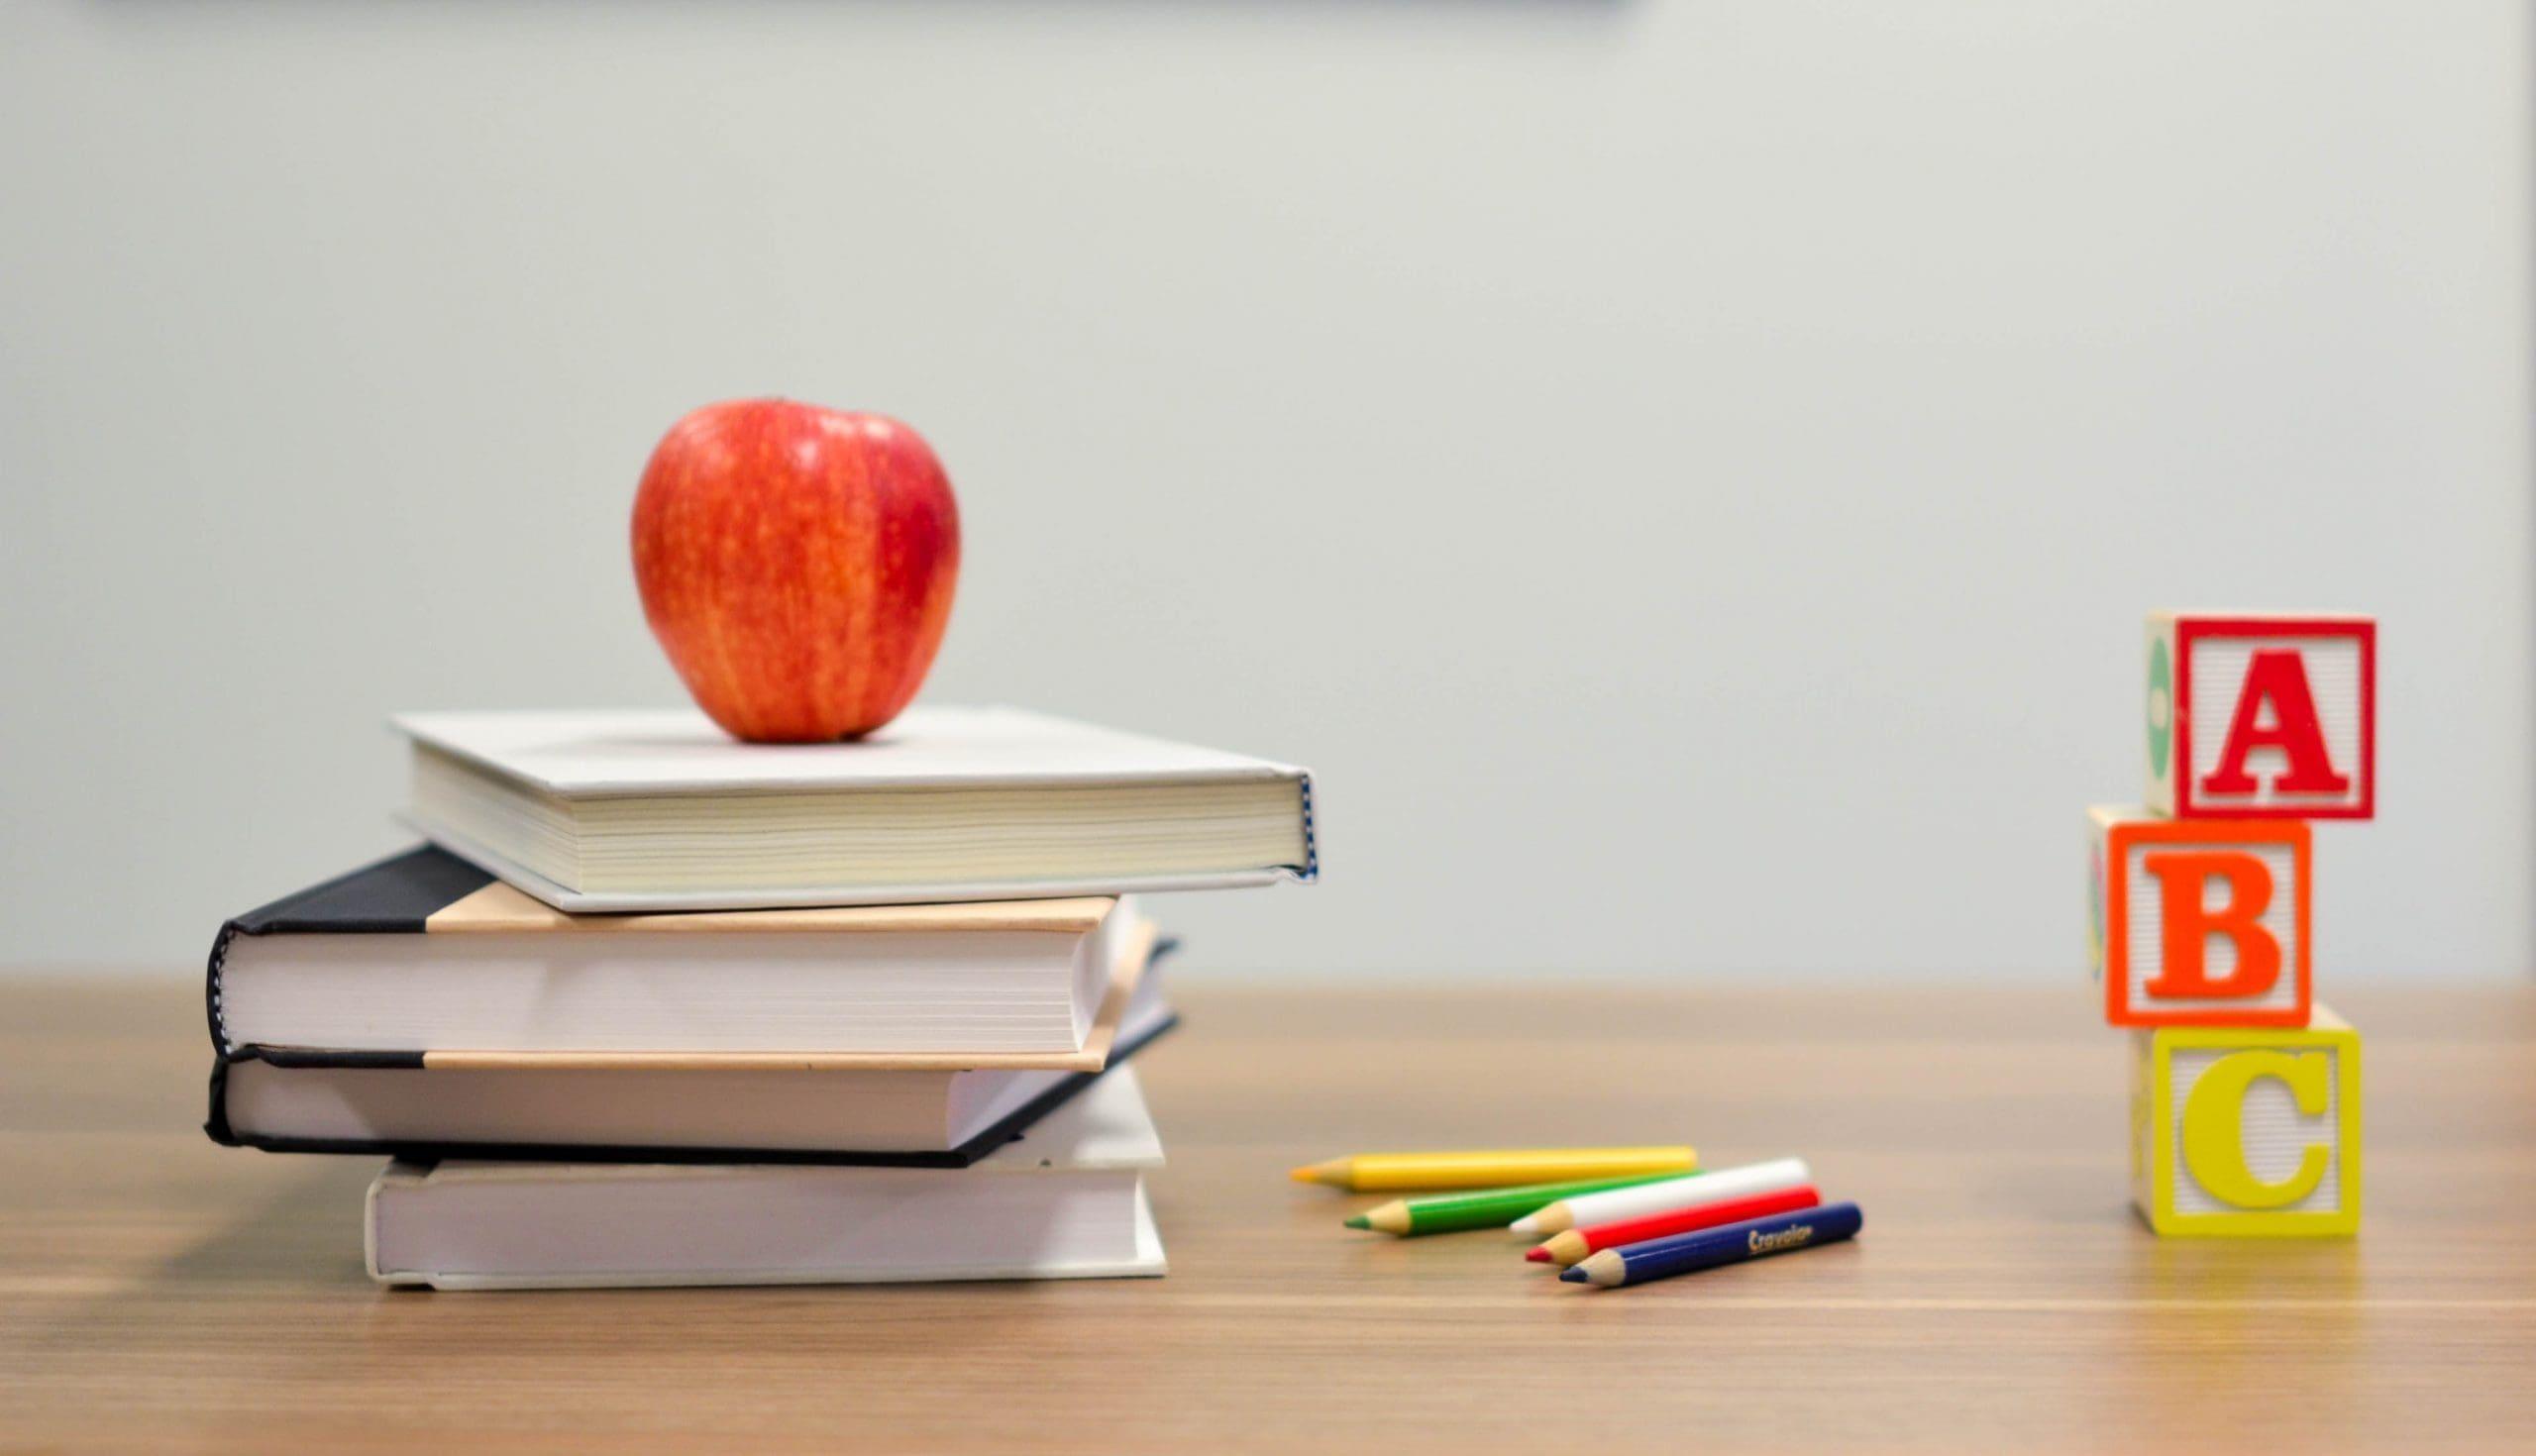 education_k-12_rectangle_abc